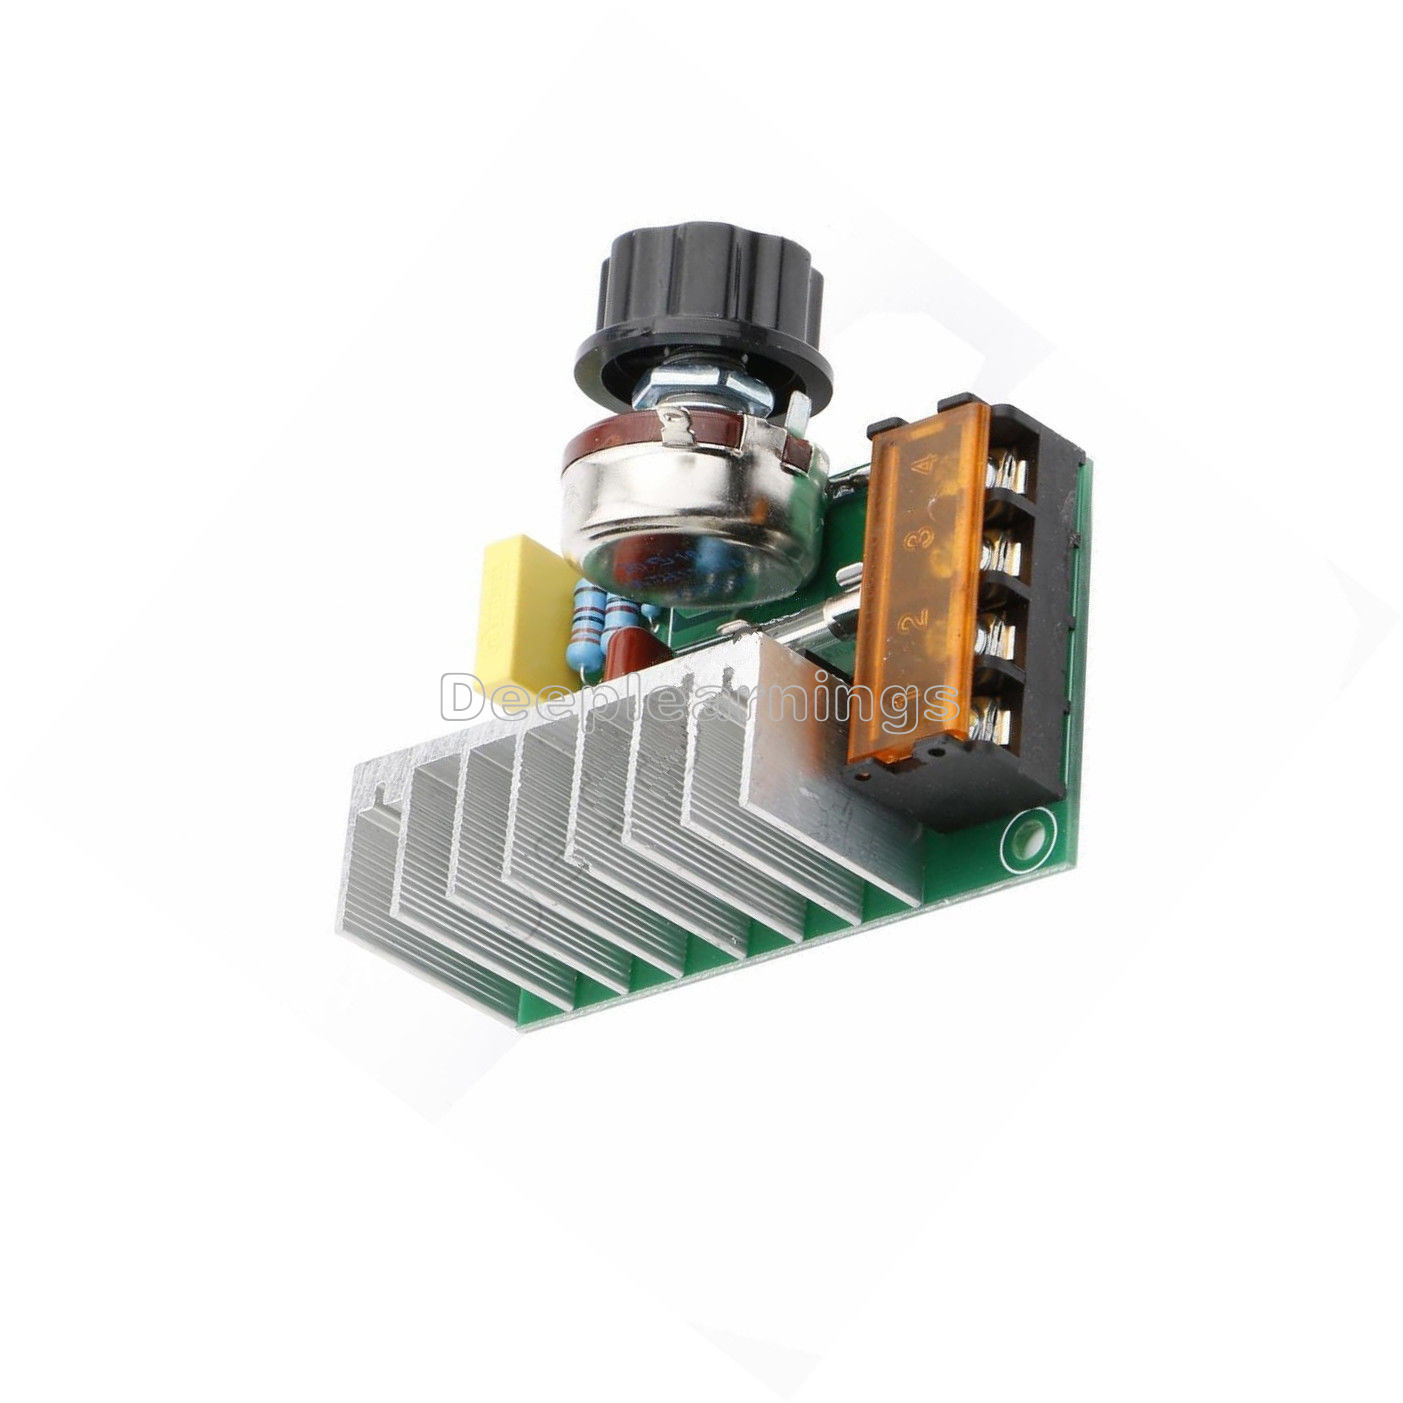 220V 2000W SCR Spannungsregler Temperaturregler Dimmer Drehzahlsteller Controlle